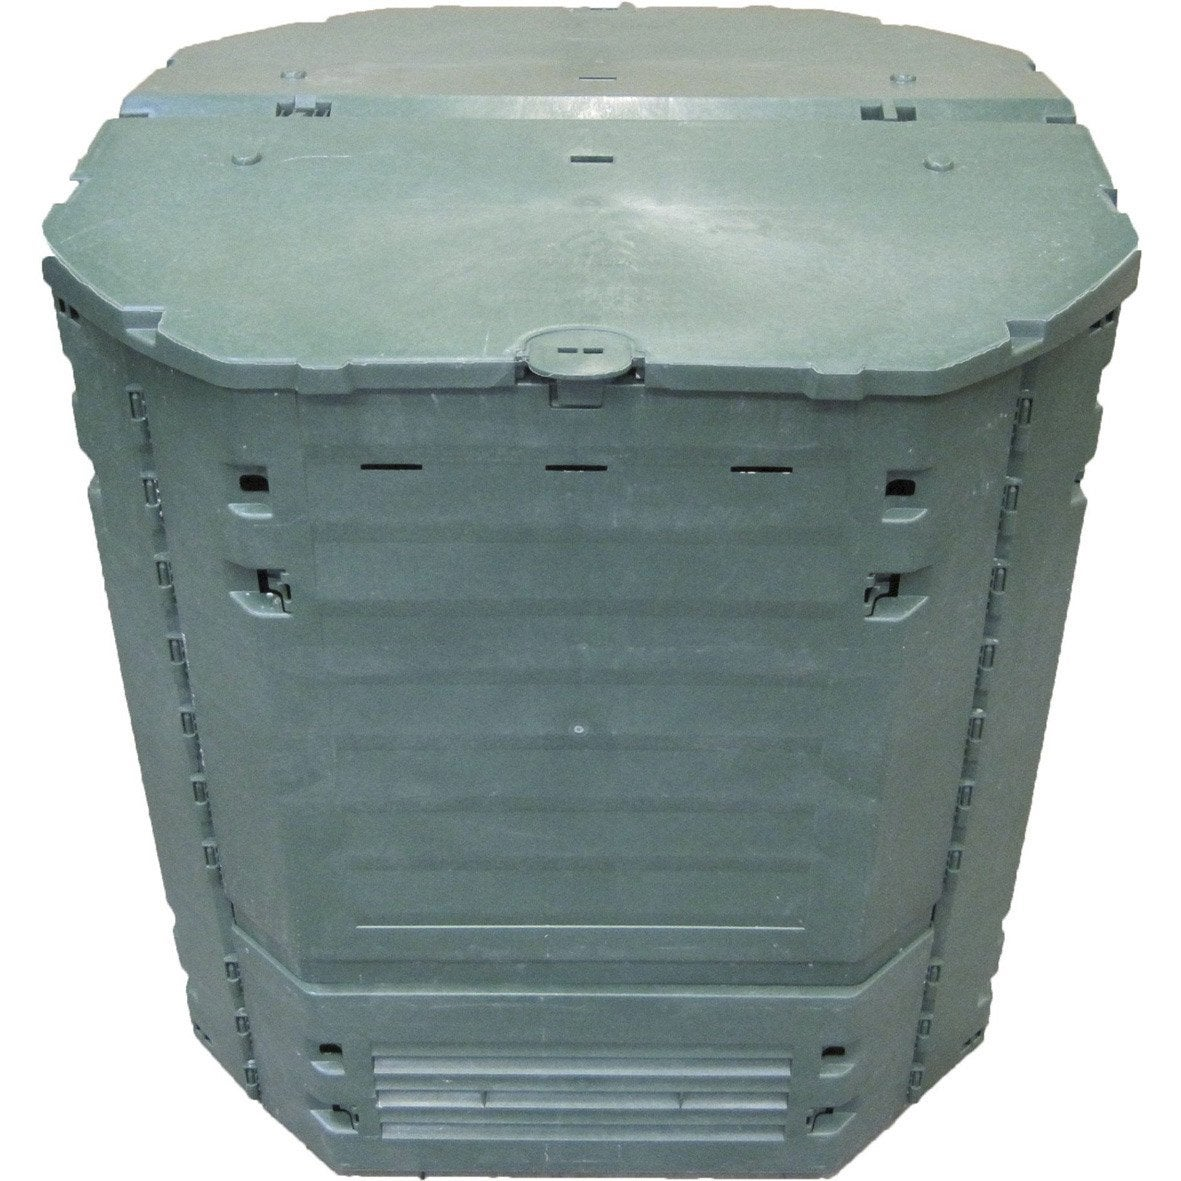 composteur monobloc garantia 626003 vert sapin 900 l. Black Bedroom Furniture Sets. Home Design Ideas